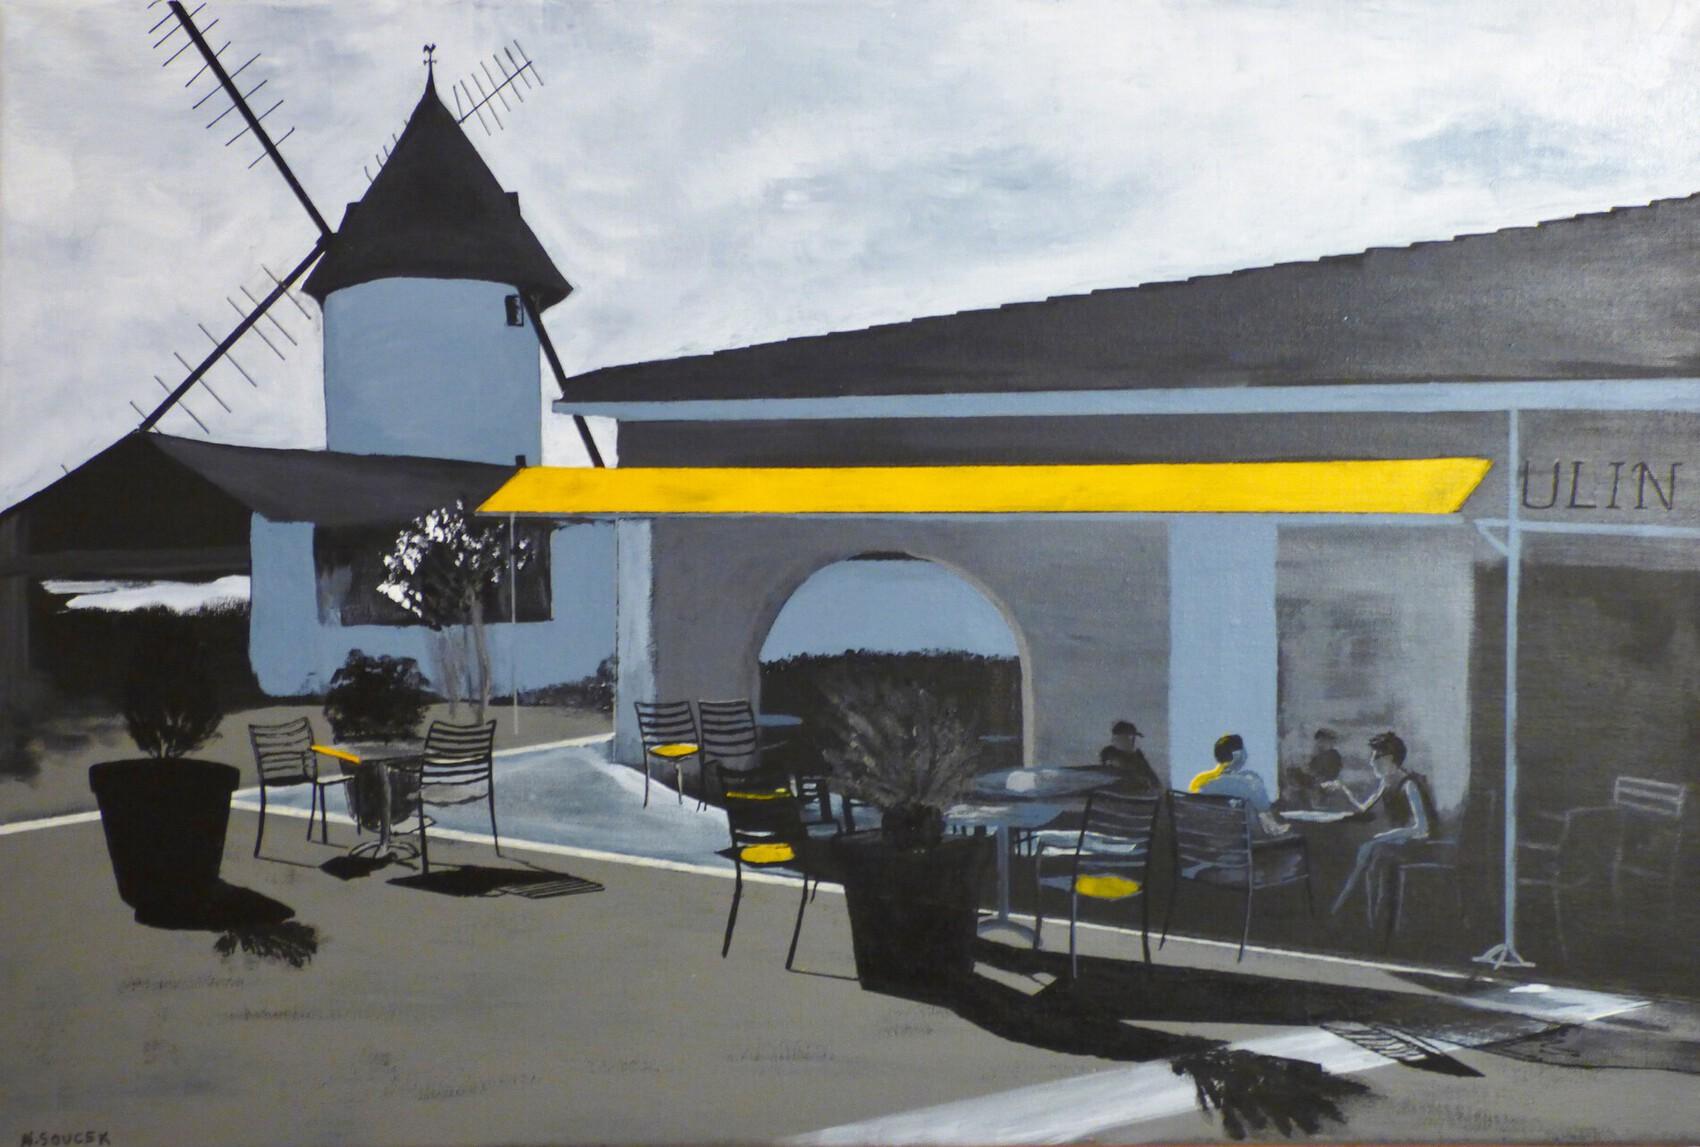 Le moulin de Nieul